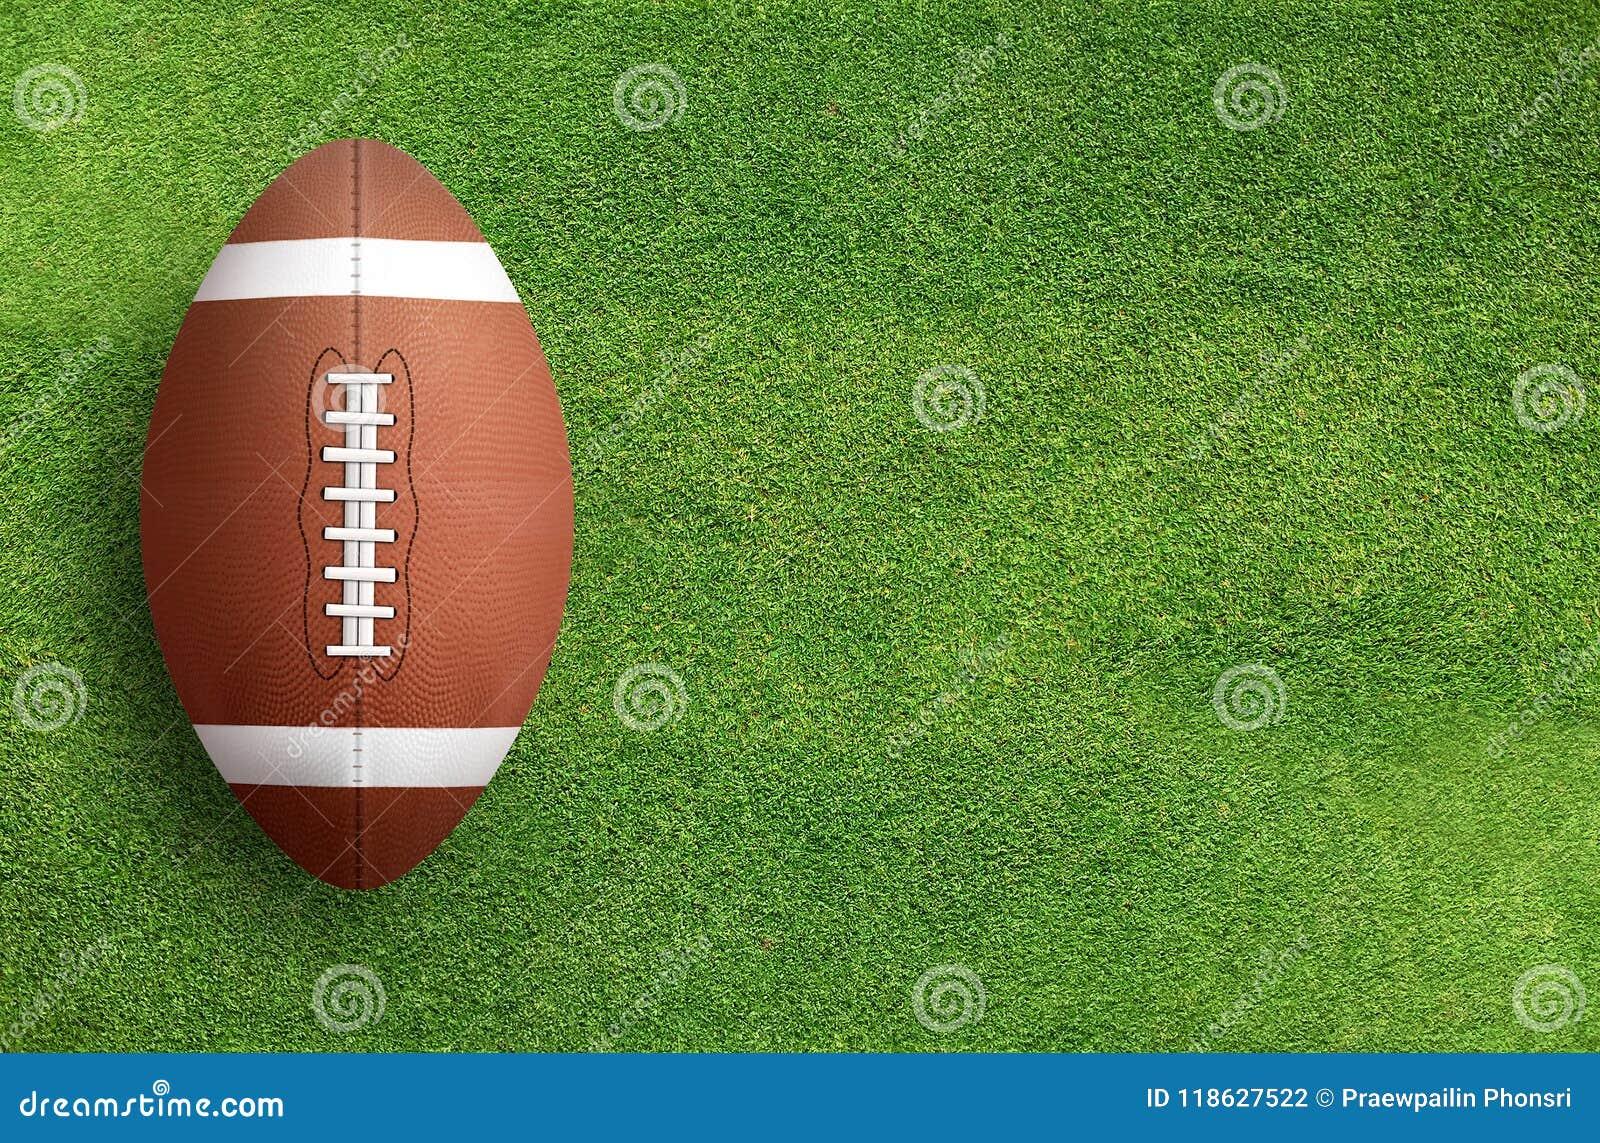 American football ball on grass field background.